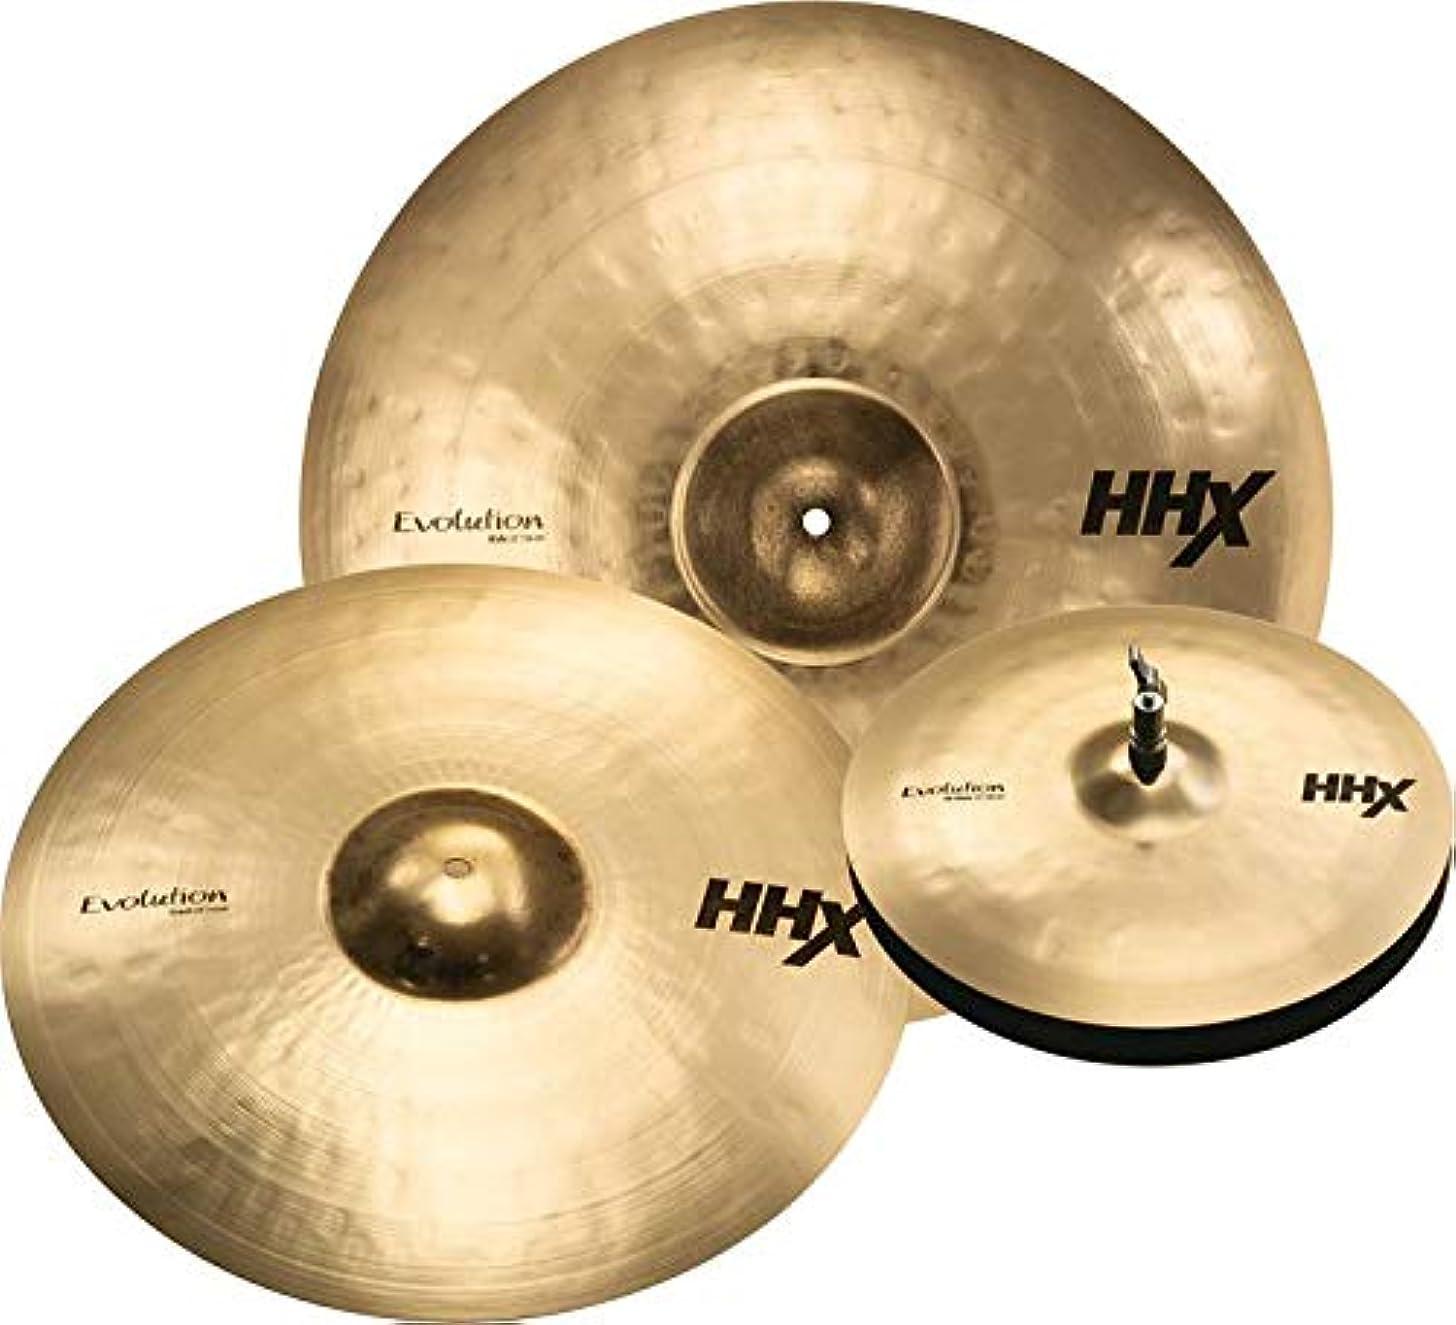 Sabian HHX Evolution Cymbal Set - 15